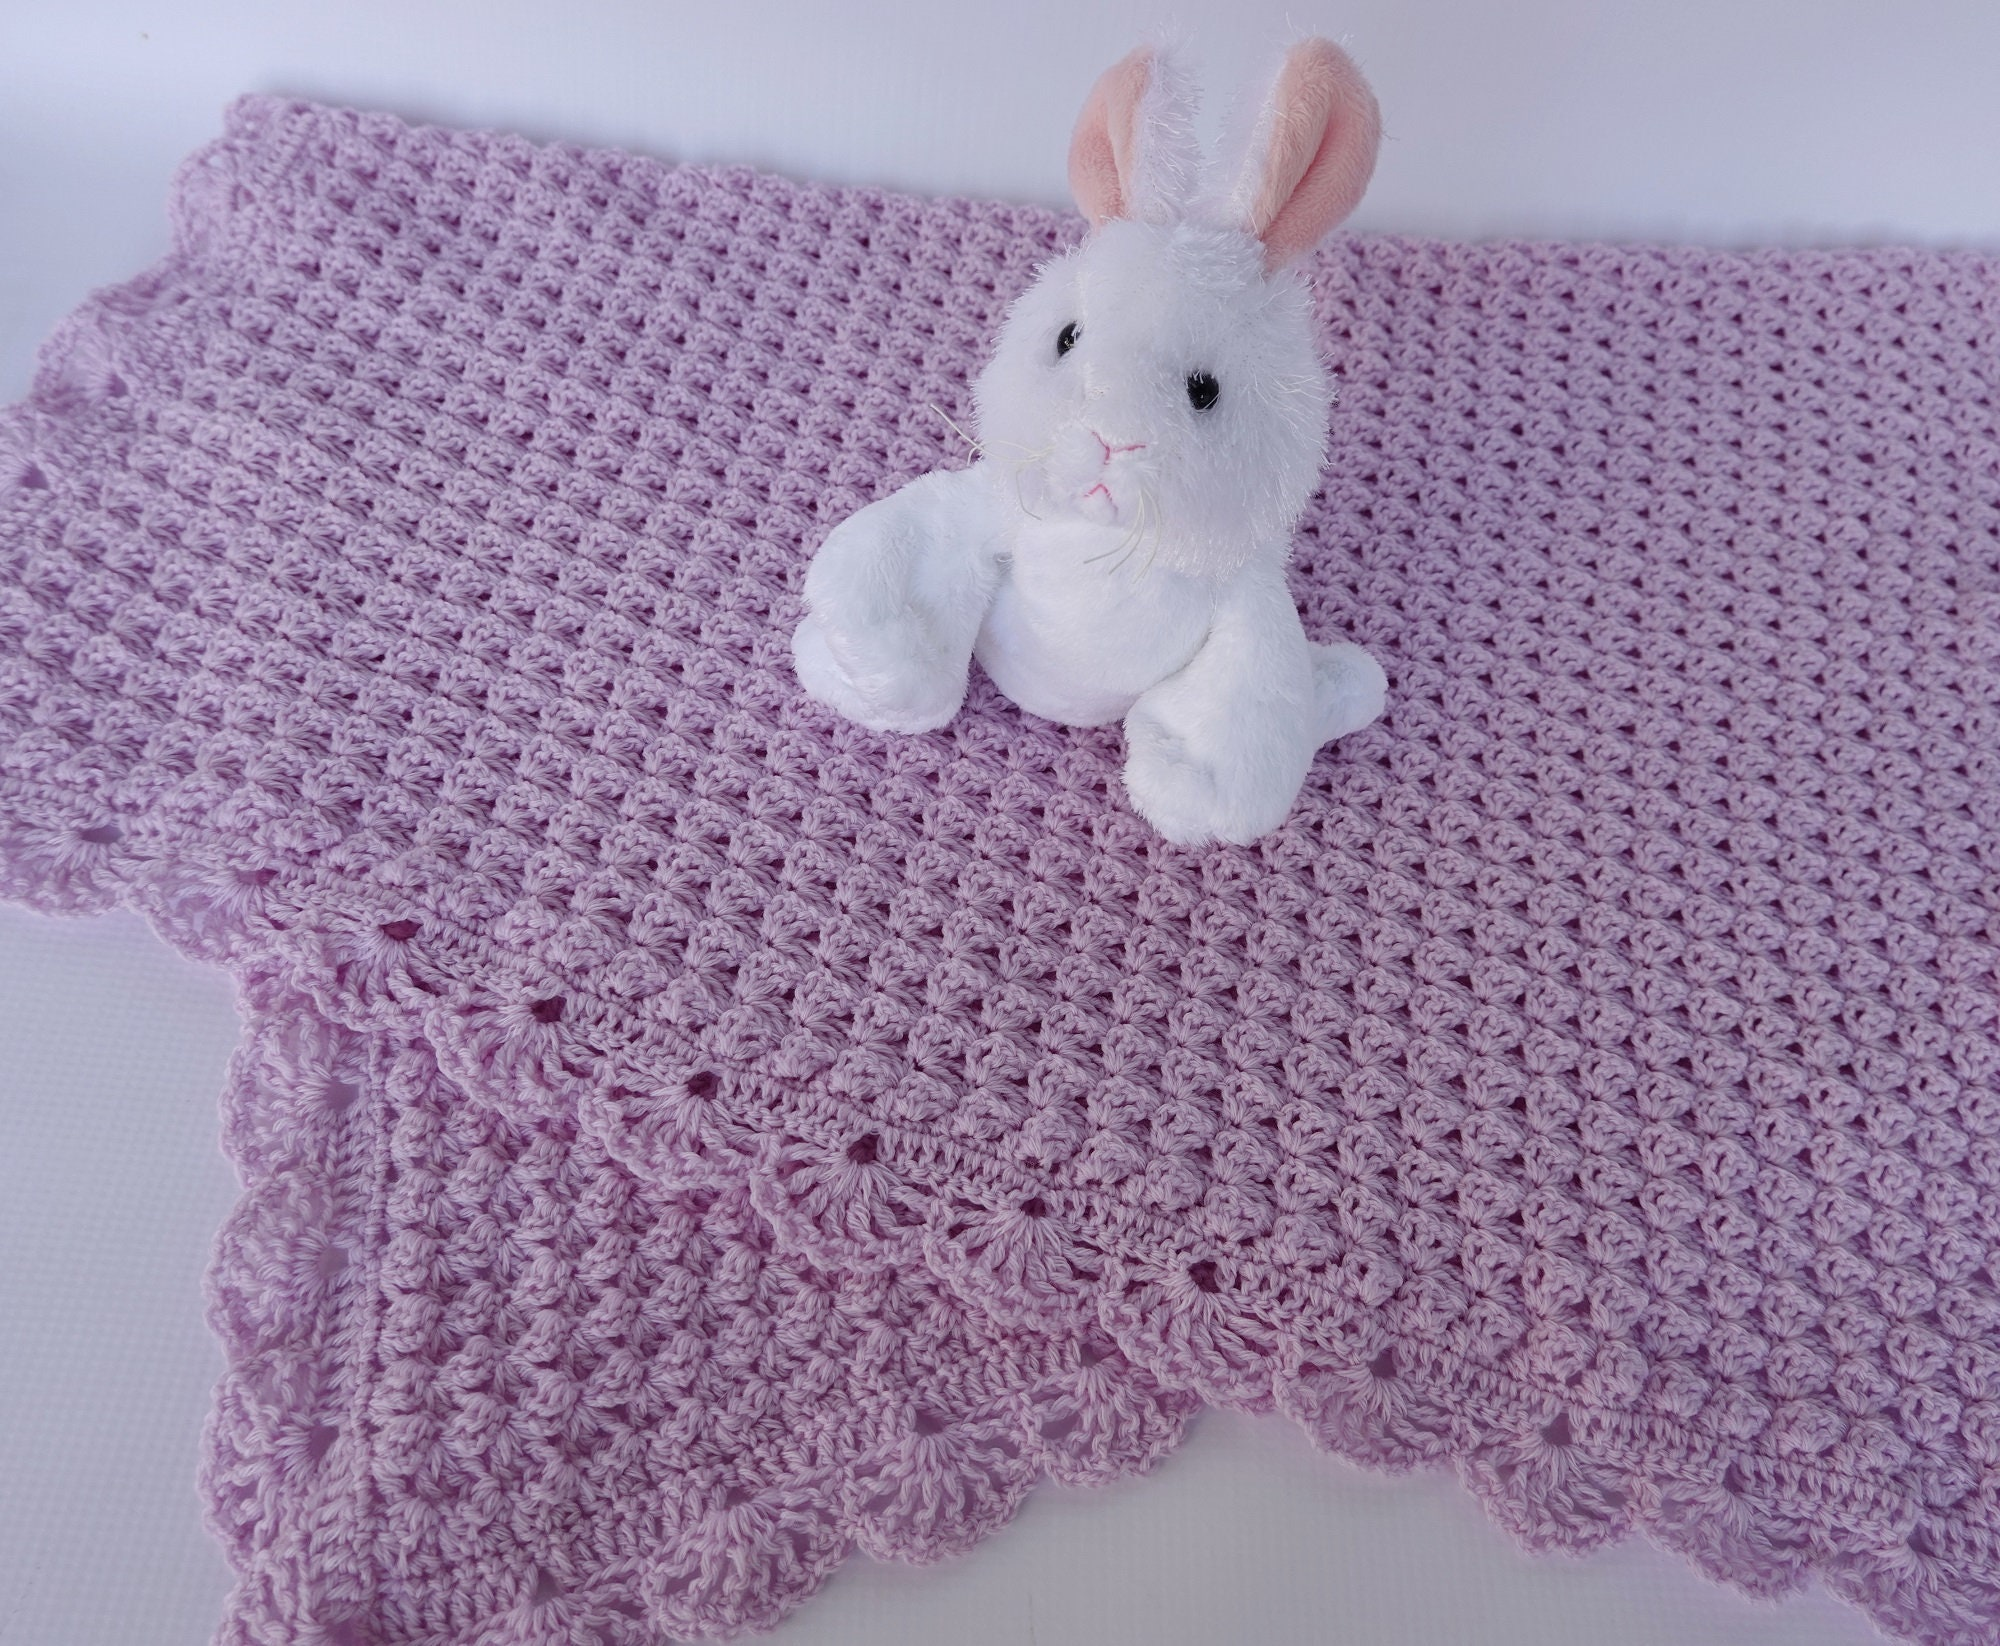 Crochet Baby Blanket, Blanket Merino Wool, Lilac Baby Blanket, Merino Wool Baby Blanket, Newborn Baby Blanket, Baby Gift, Christening Gift